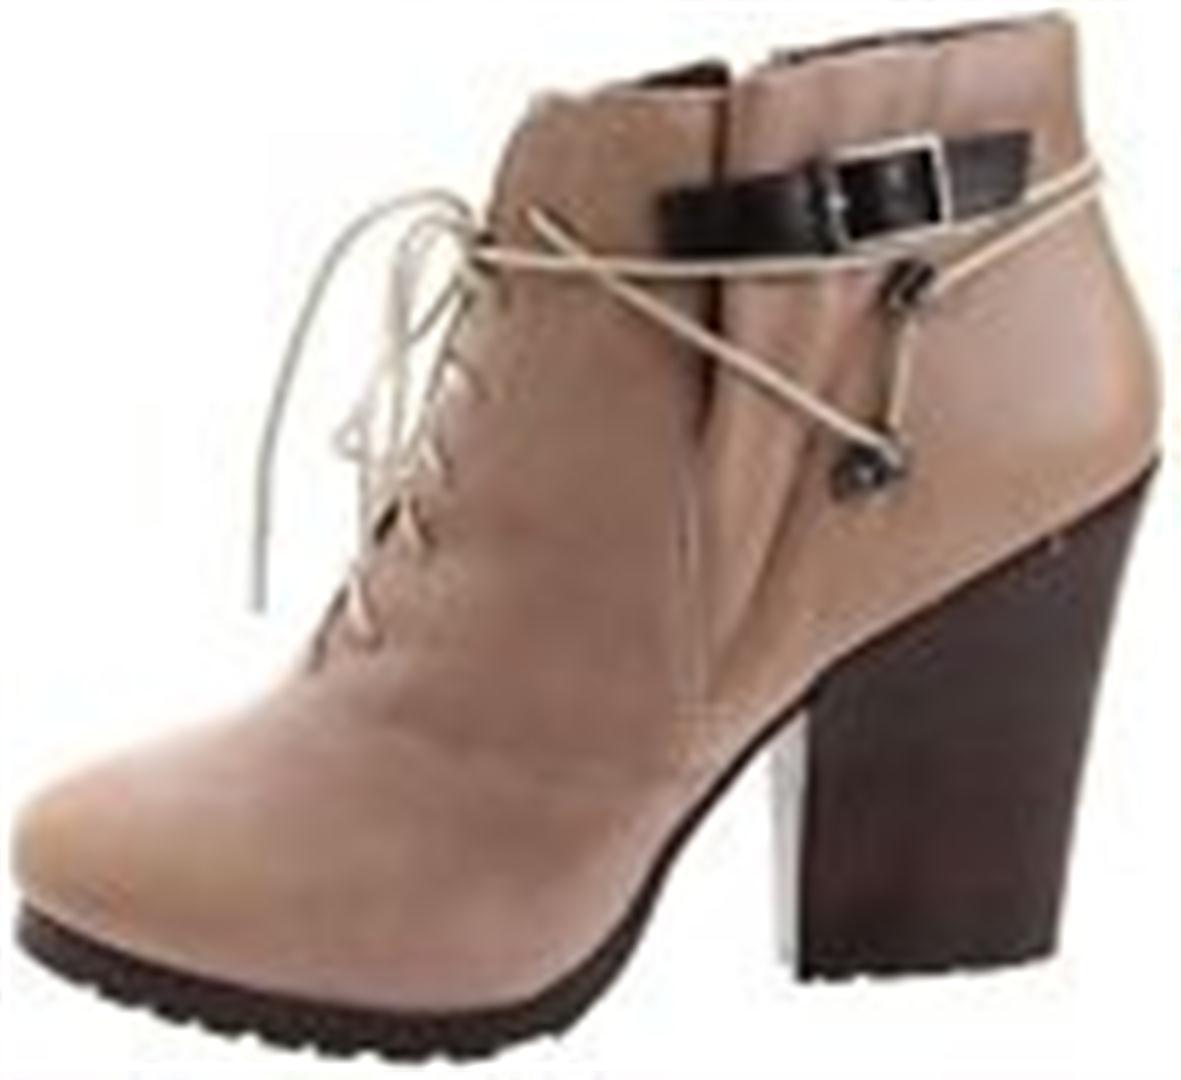 New Women's Bacio 61 Pesanti Cement Leather boots  size 9  (MSR 160)